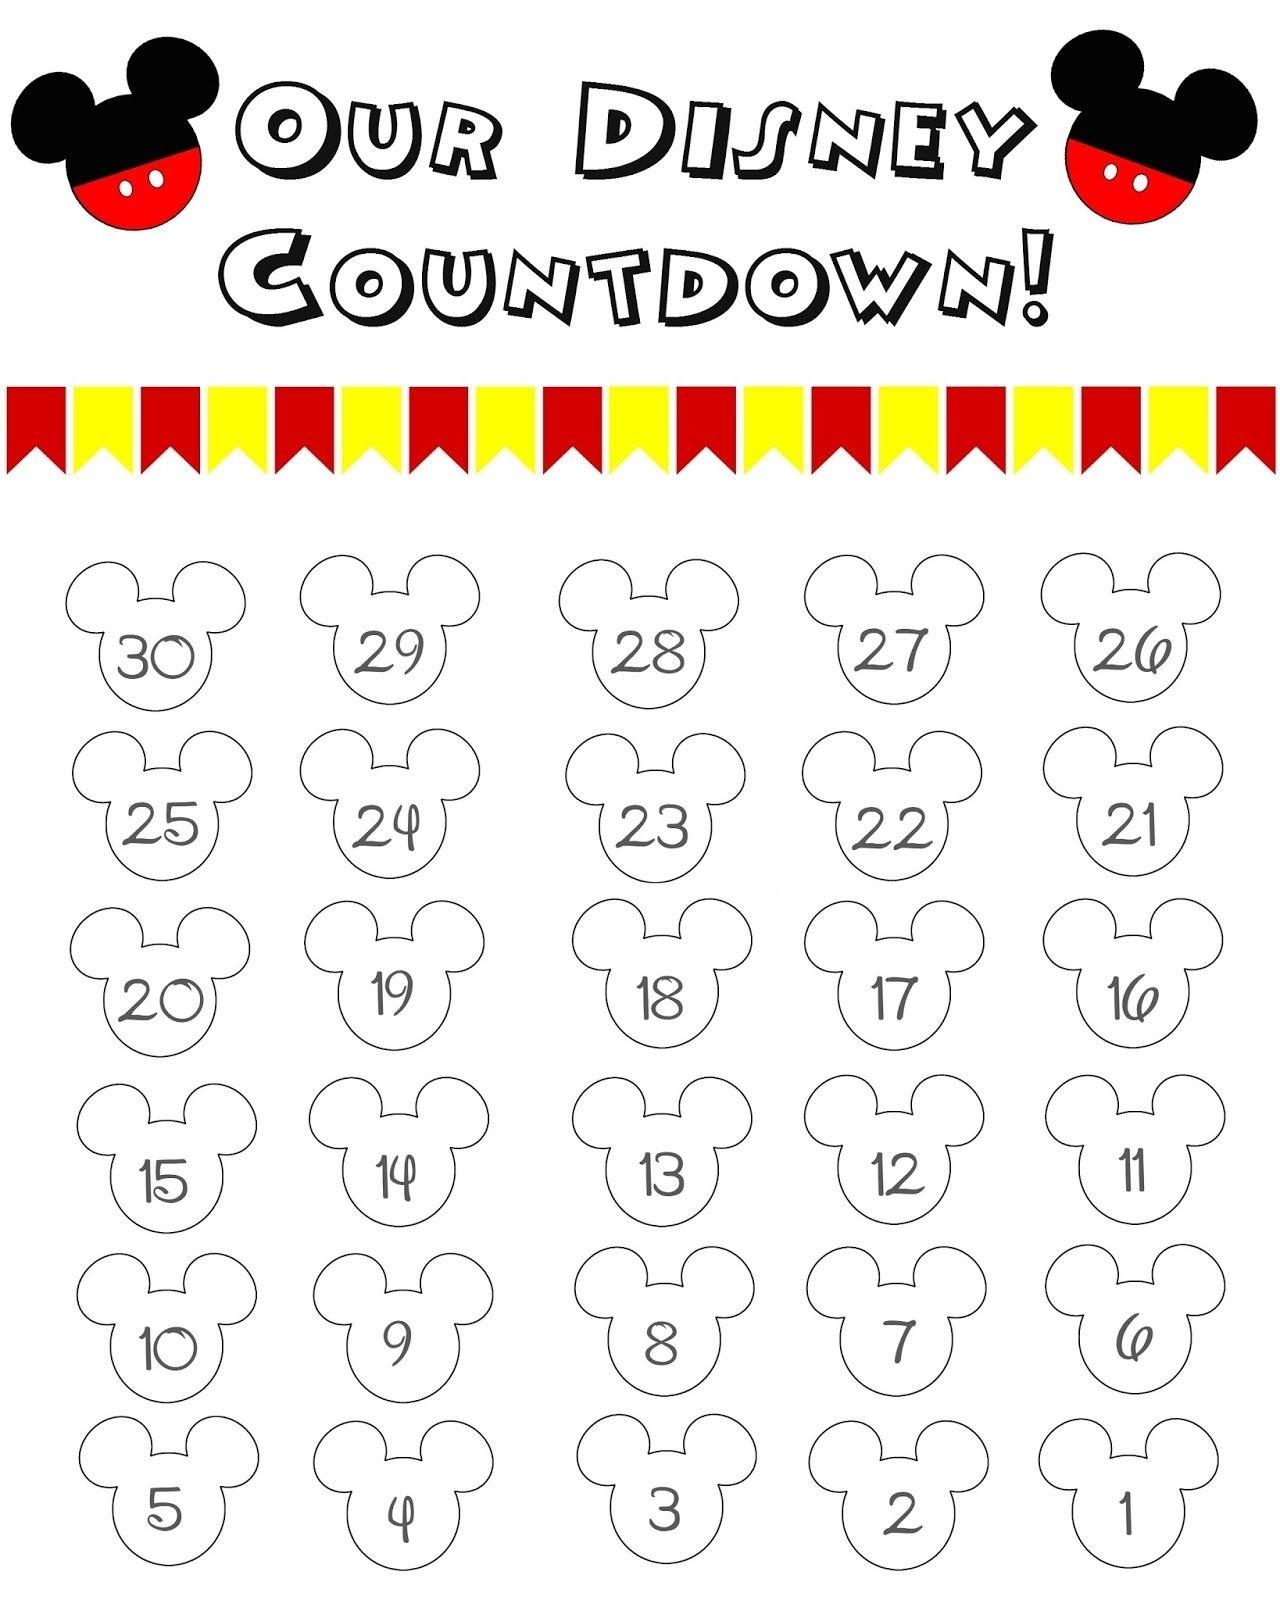 Disney World Countdown Calendar - Free Printable | The Momma Diaries with regard to Free Printable Vacation Countdown Calendar